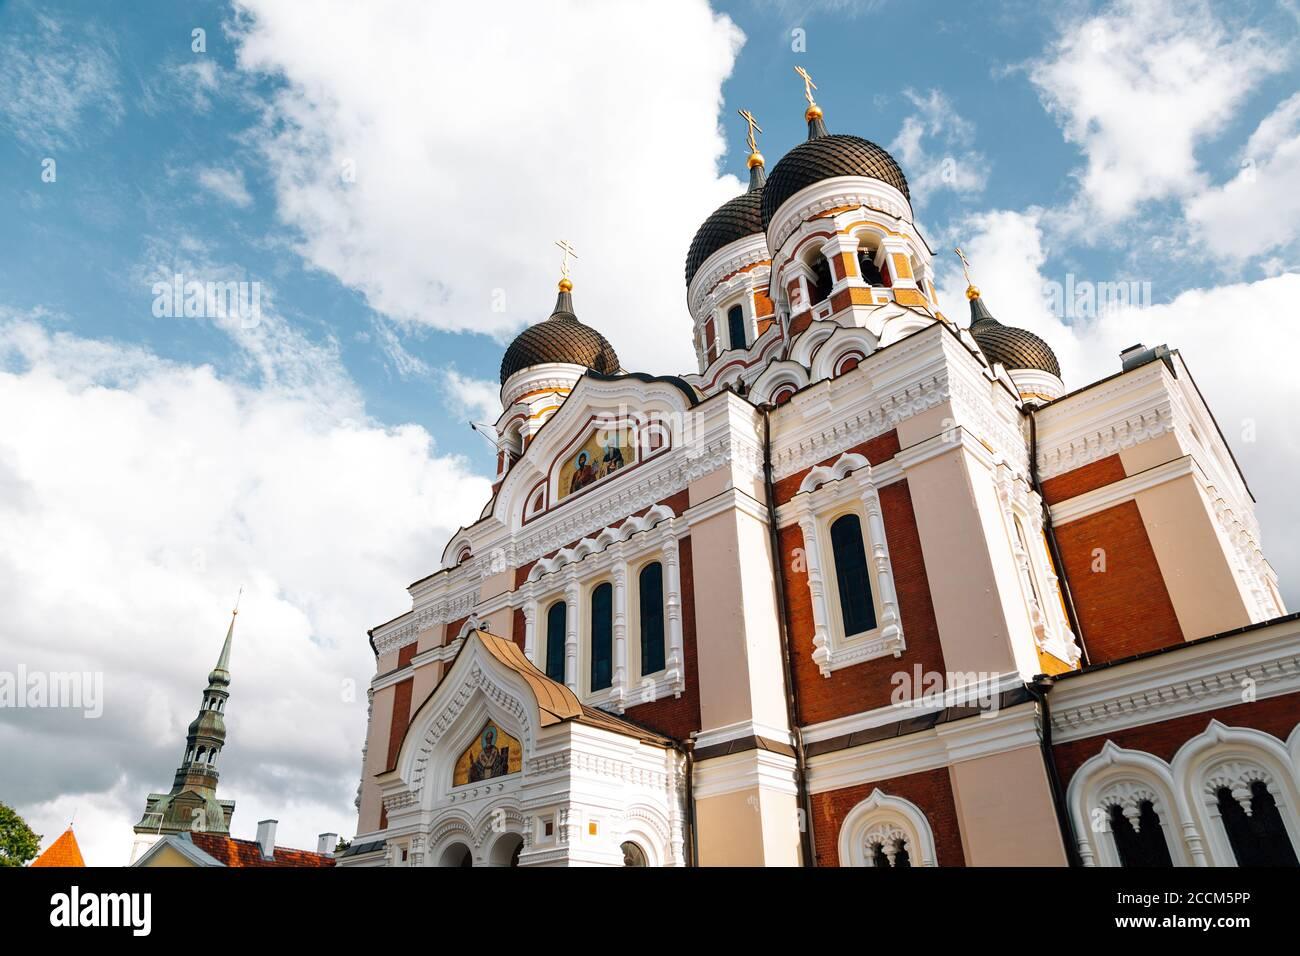 Alexander Nevsky Cathedral in Tallinn, Estonia Stock Photo